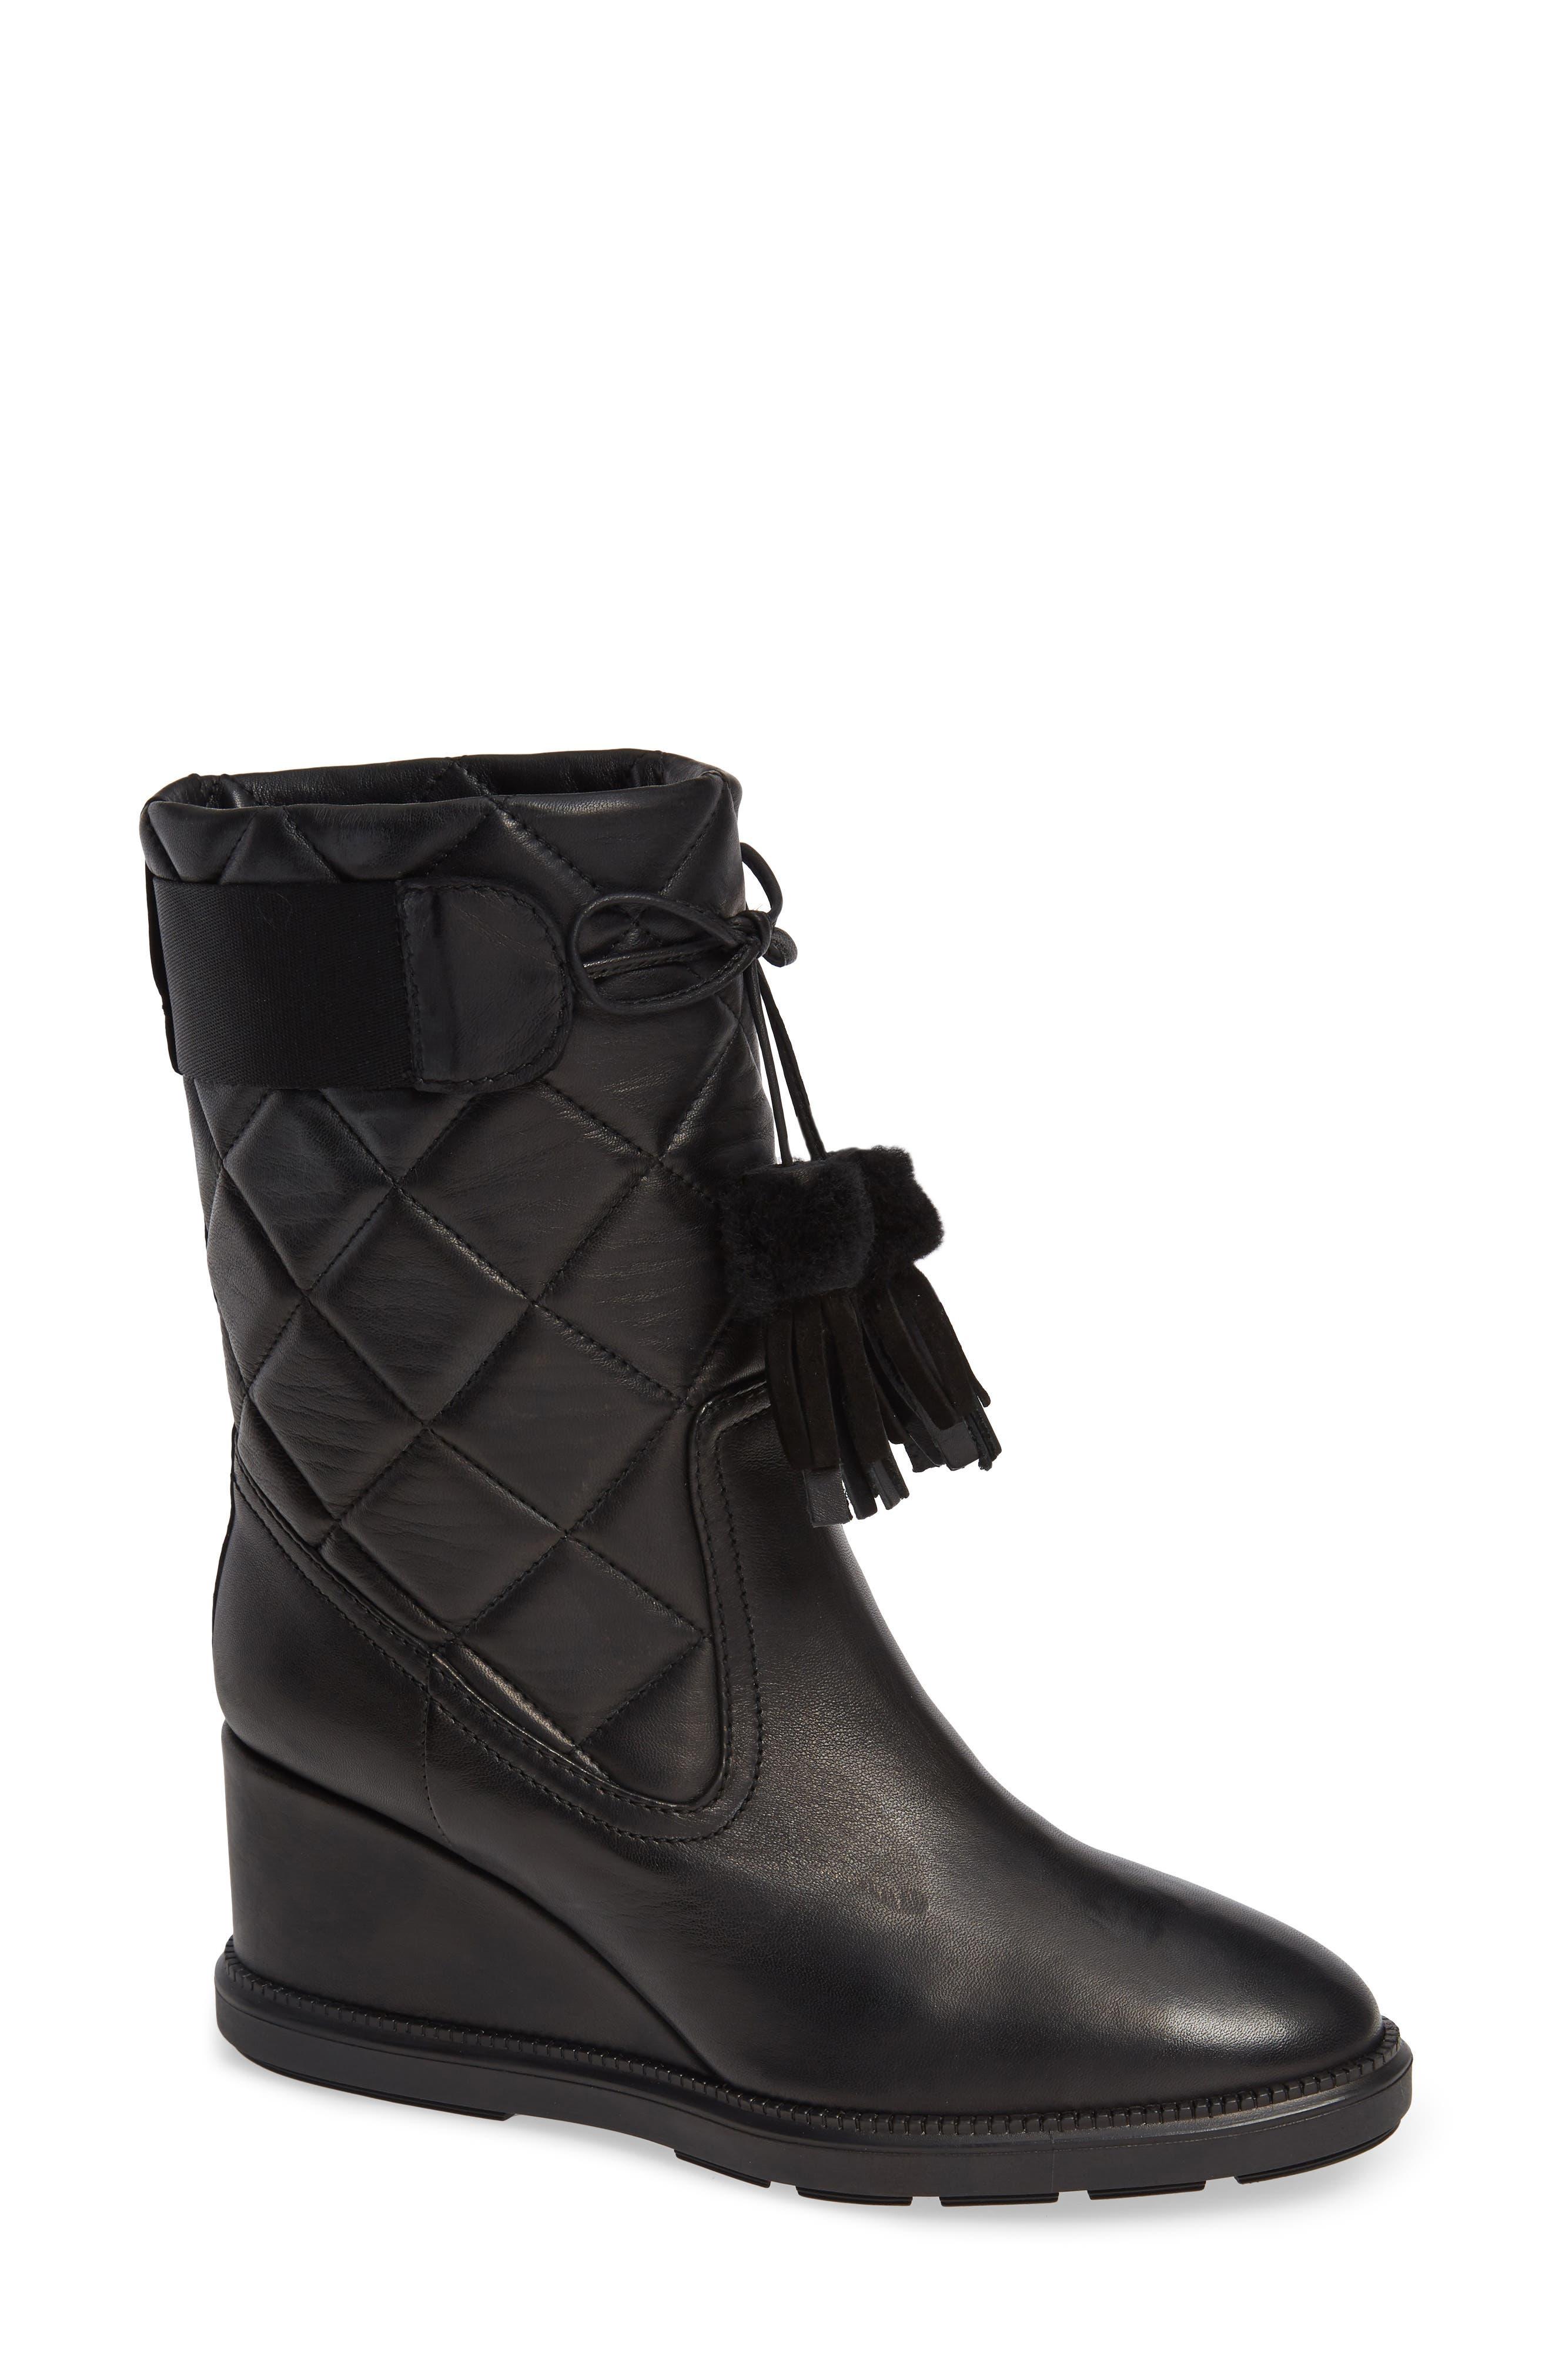 Caliana Water Resistant Genuine Shearling Lined Boot,                             Main thumbnail 1, color,                             BLACK NAPPA